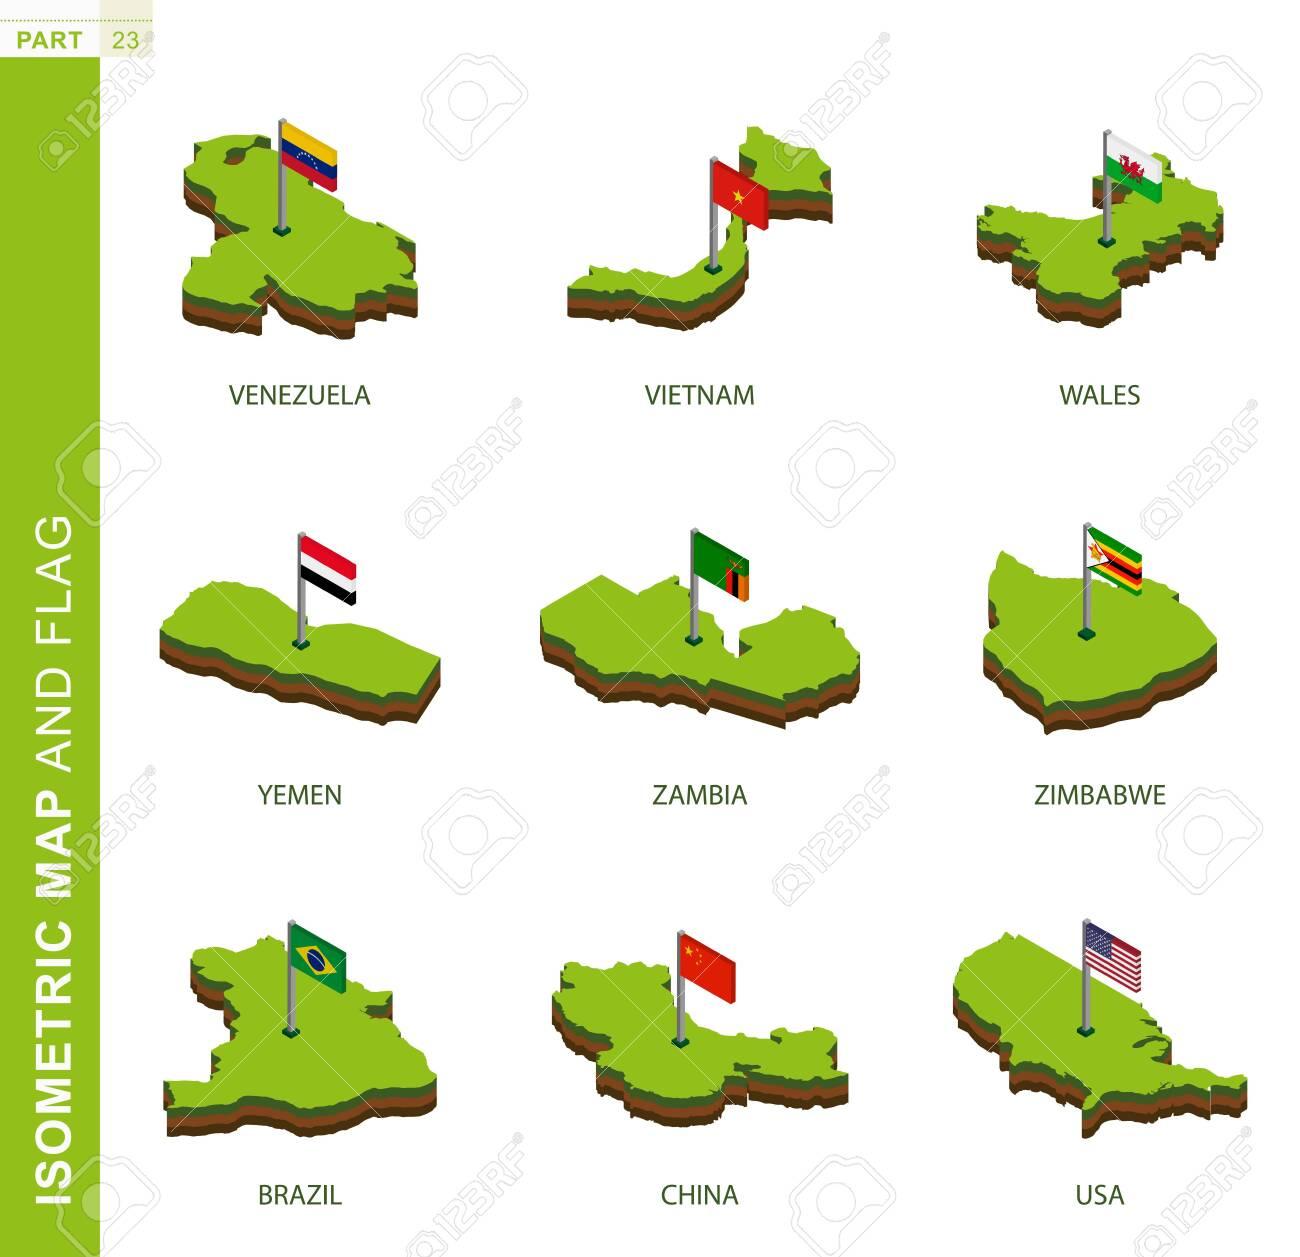 Set of 9 isometric map and flag, 3D vector isometric shape of Venezuela, Vietnam, Wales, Yemen, Zambia, Zimbabwe, Brazil, China, USA - 134229935